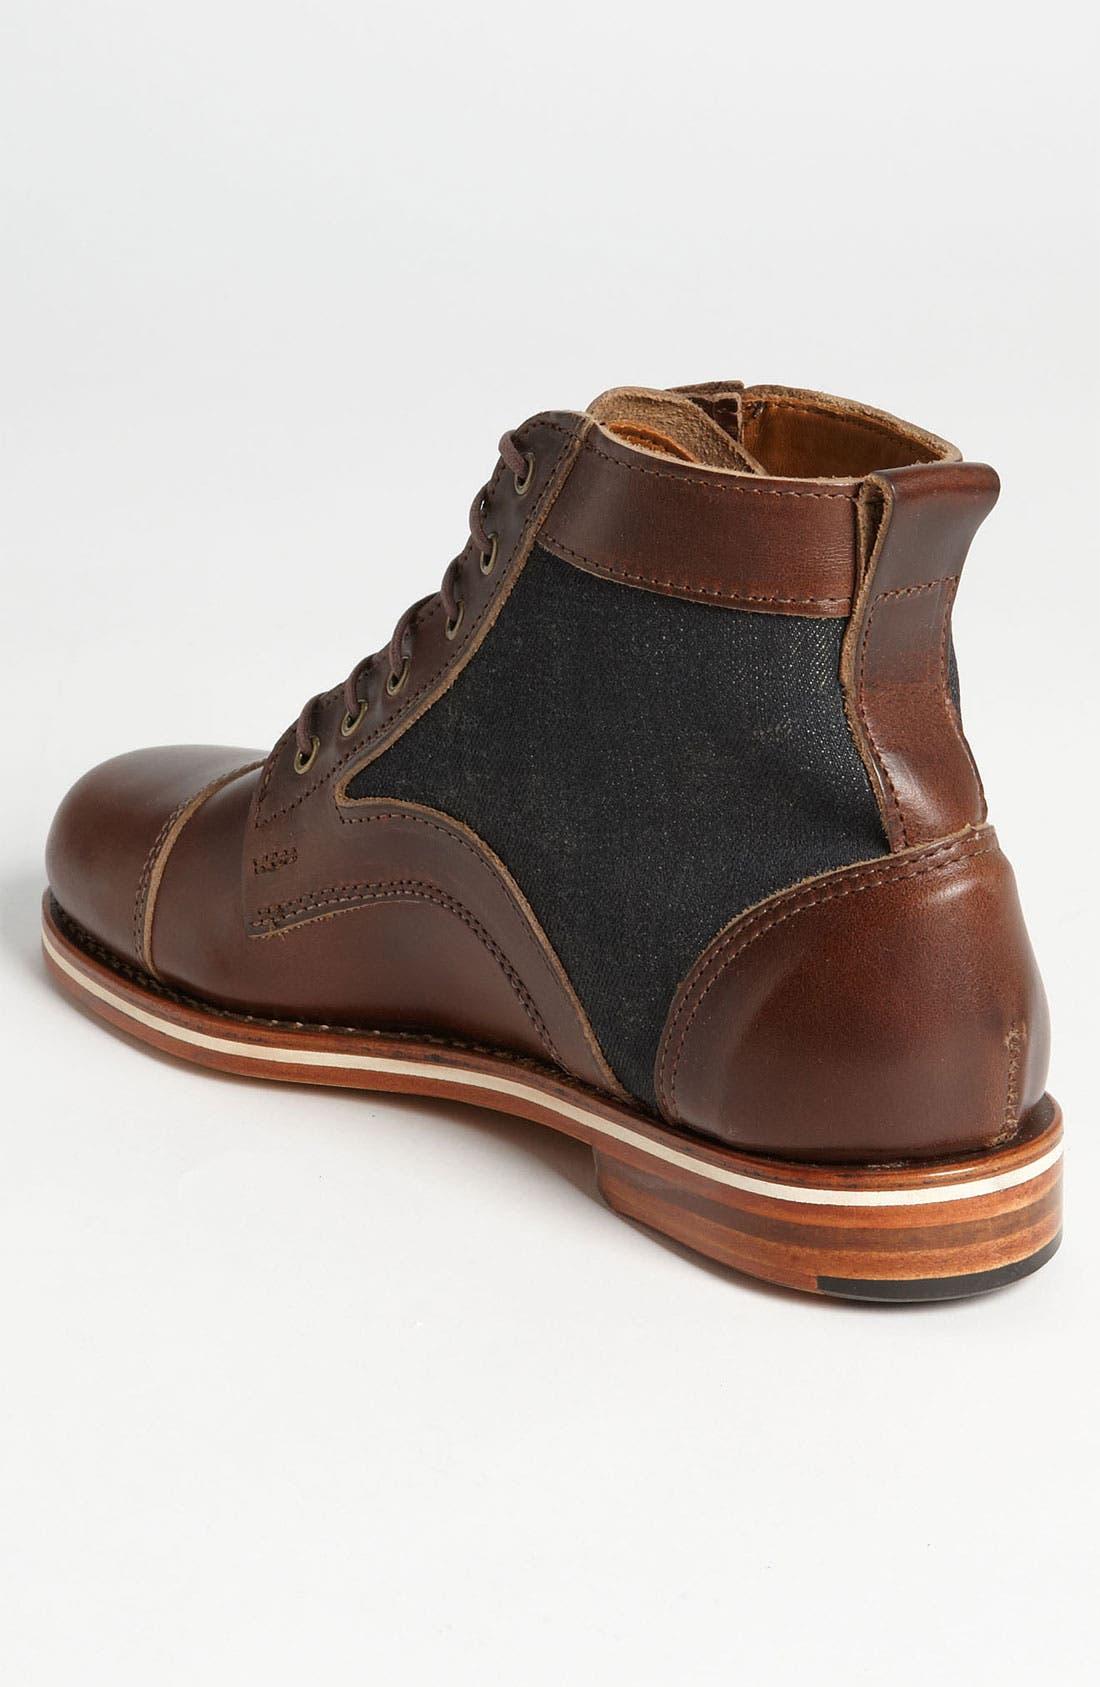 HELM, 'Reid' Cap Toe Boot, Alternate thumbnail 2, color, 200